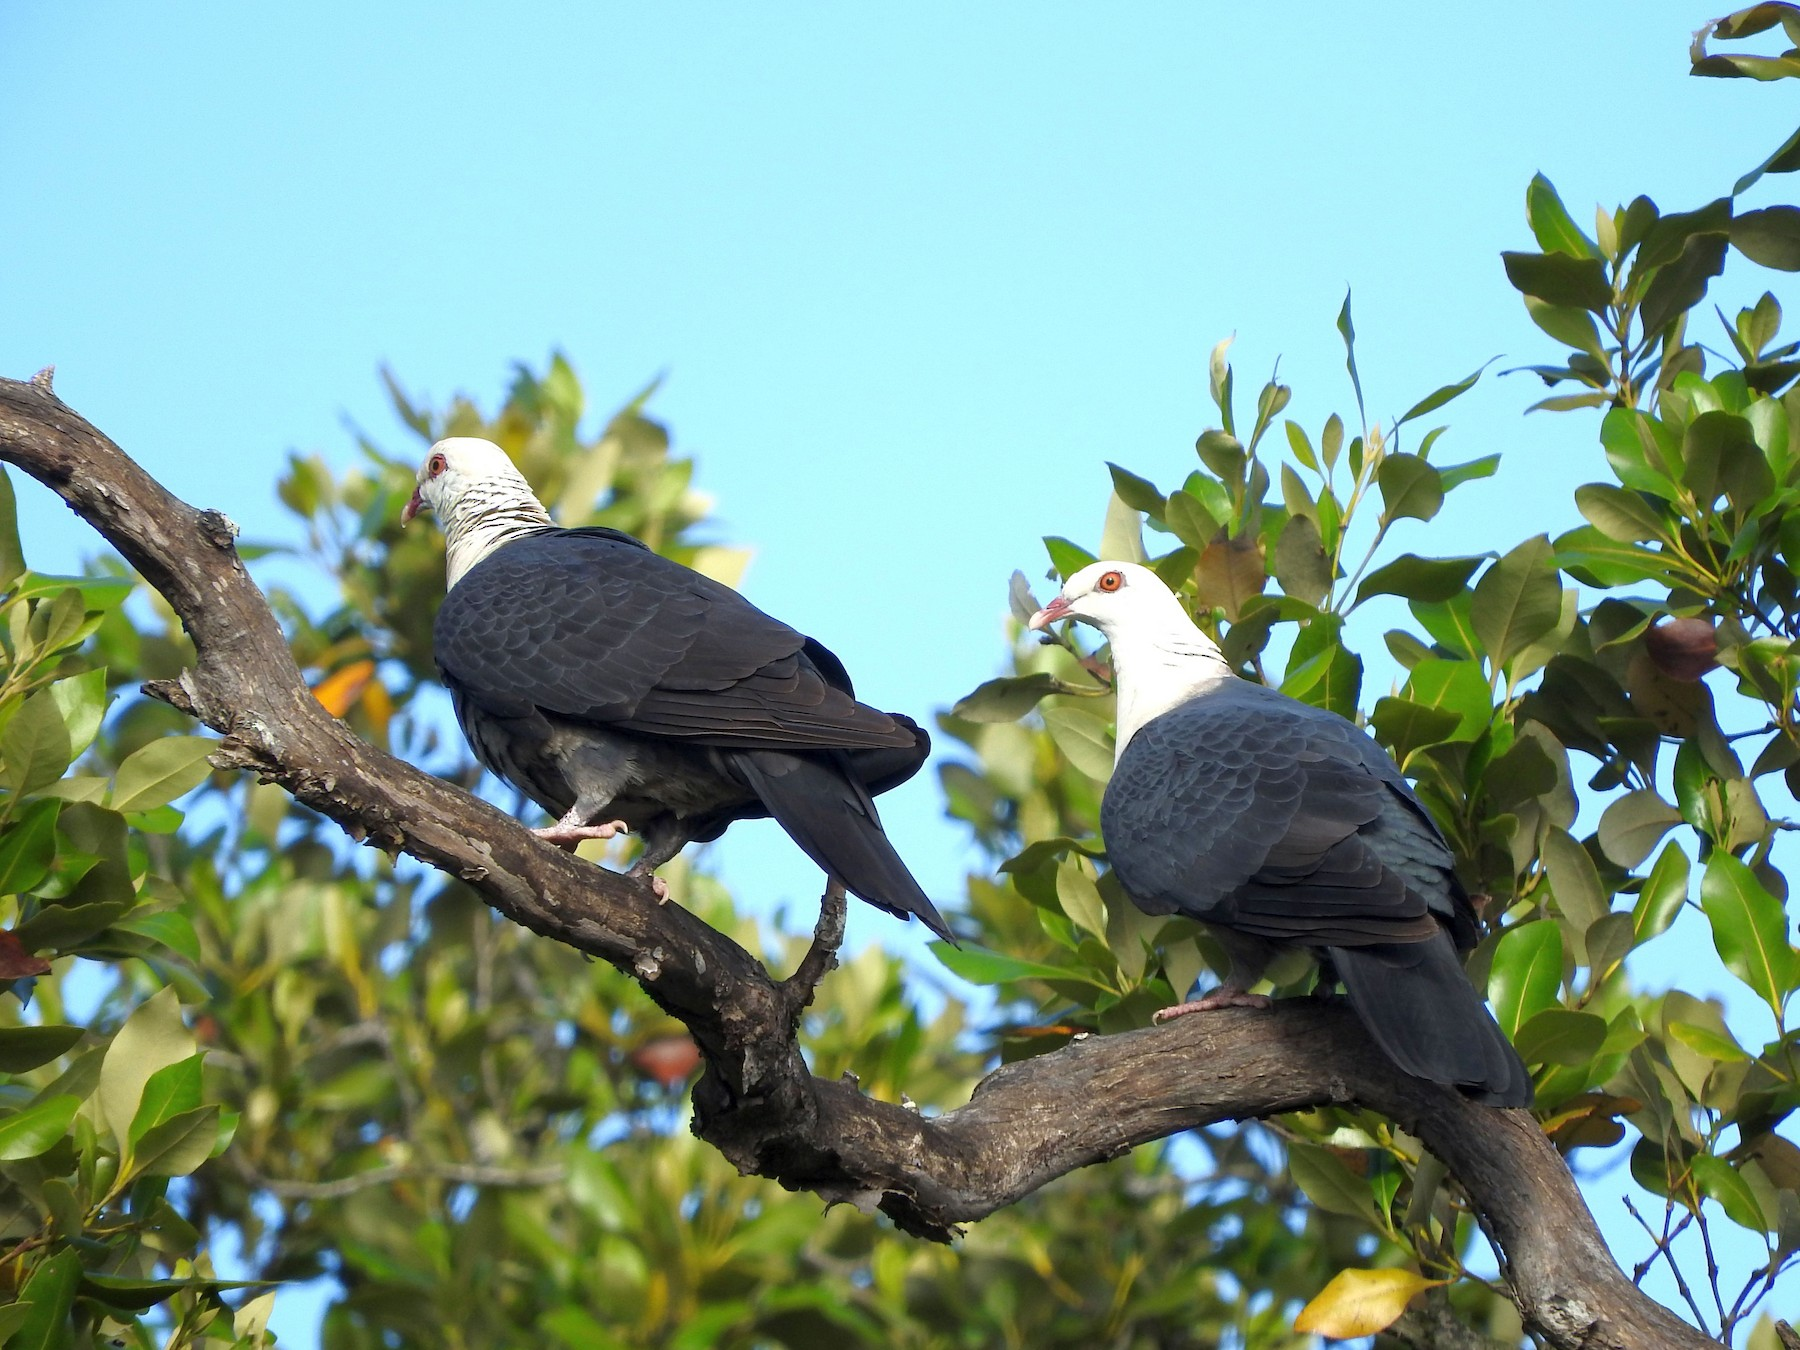 White-headed Pigeon - Chris Burwell